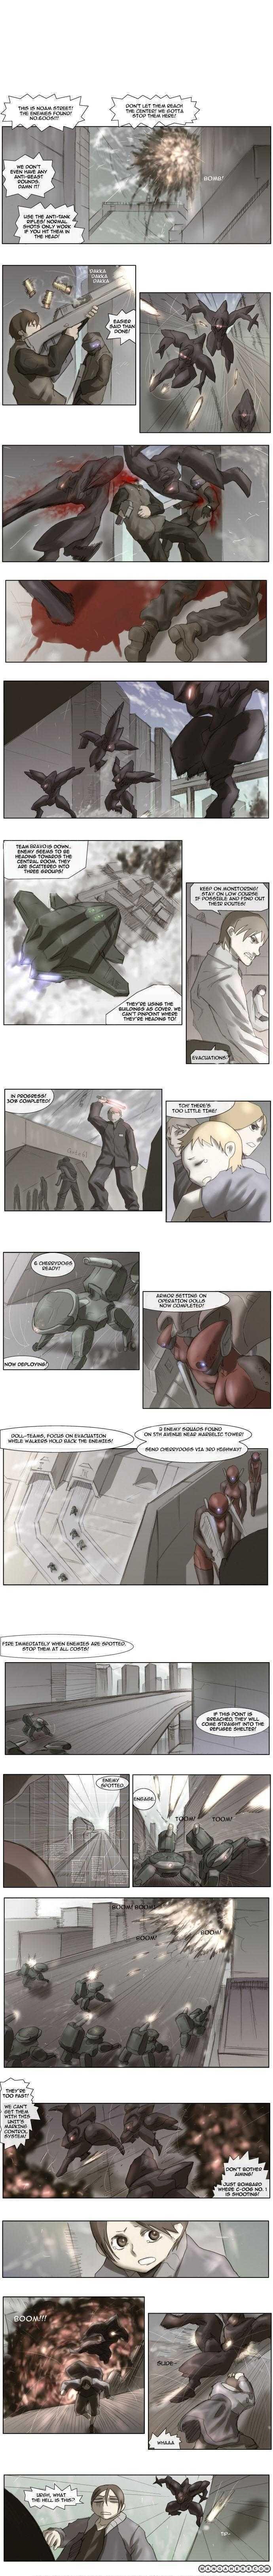 Knight Run 11 Page 1